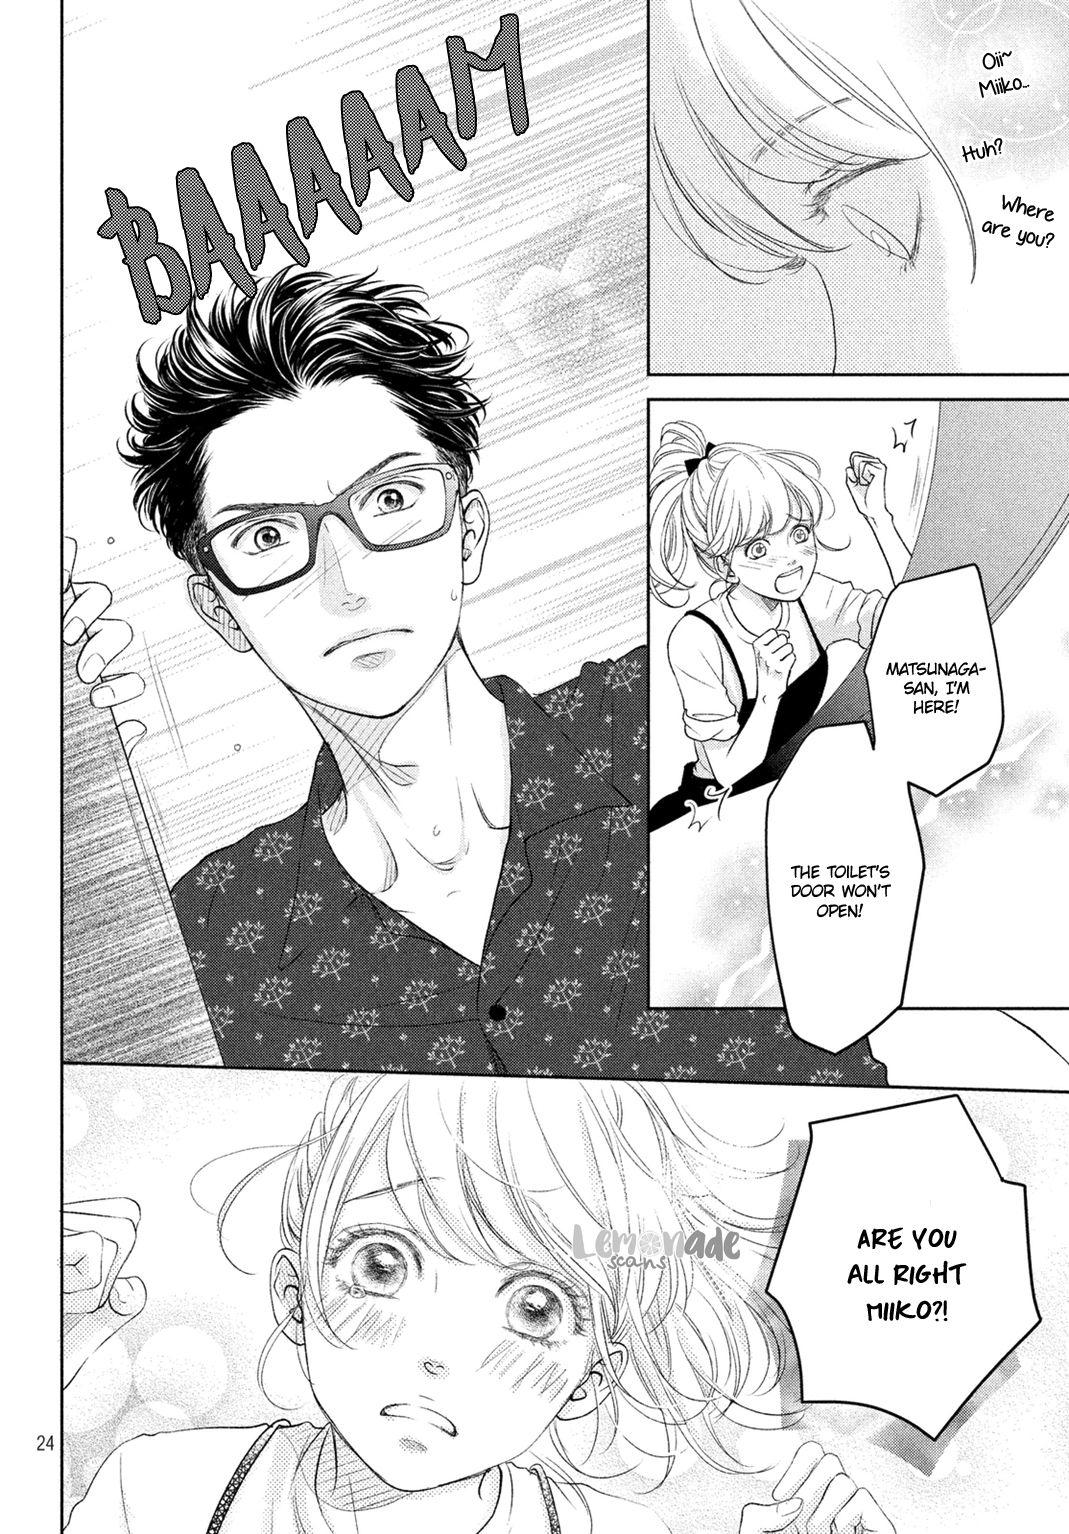 Read Manga Living No Matsunaga San Vol 001 Ch 002 Online In High Quality Anime Manga Mangas Romanticos Manga Shojo